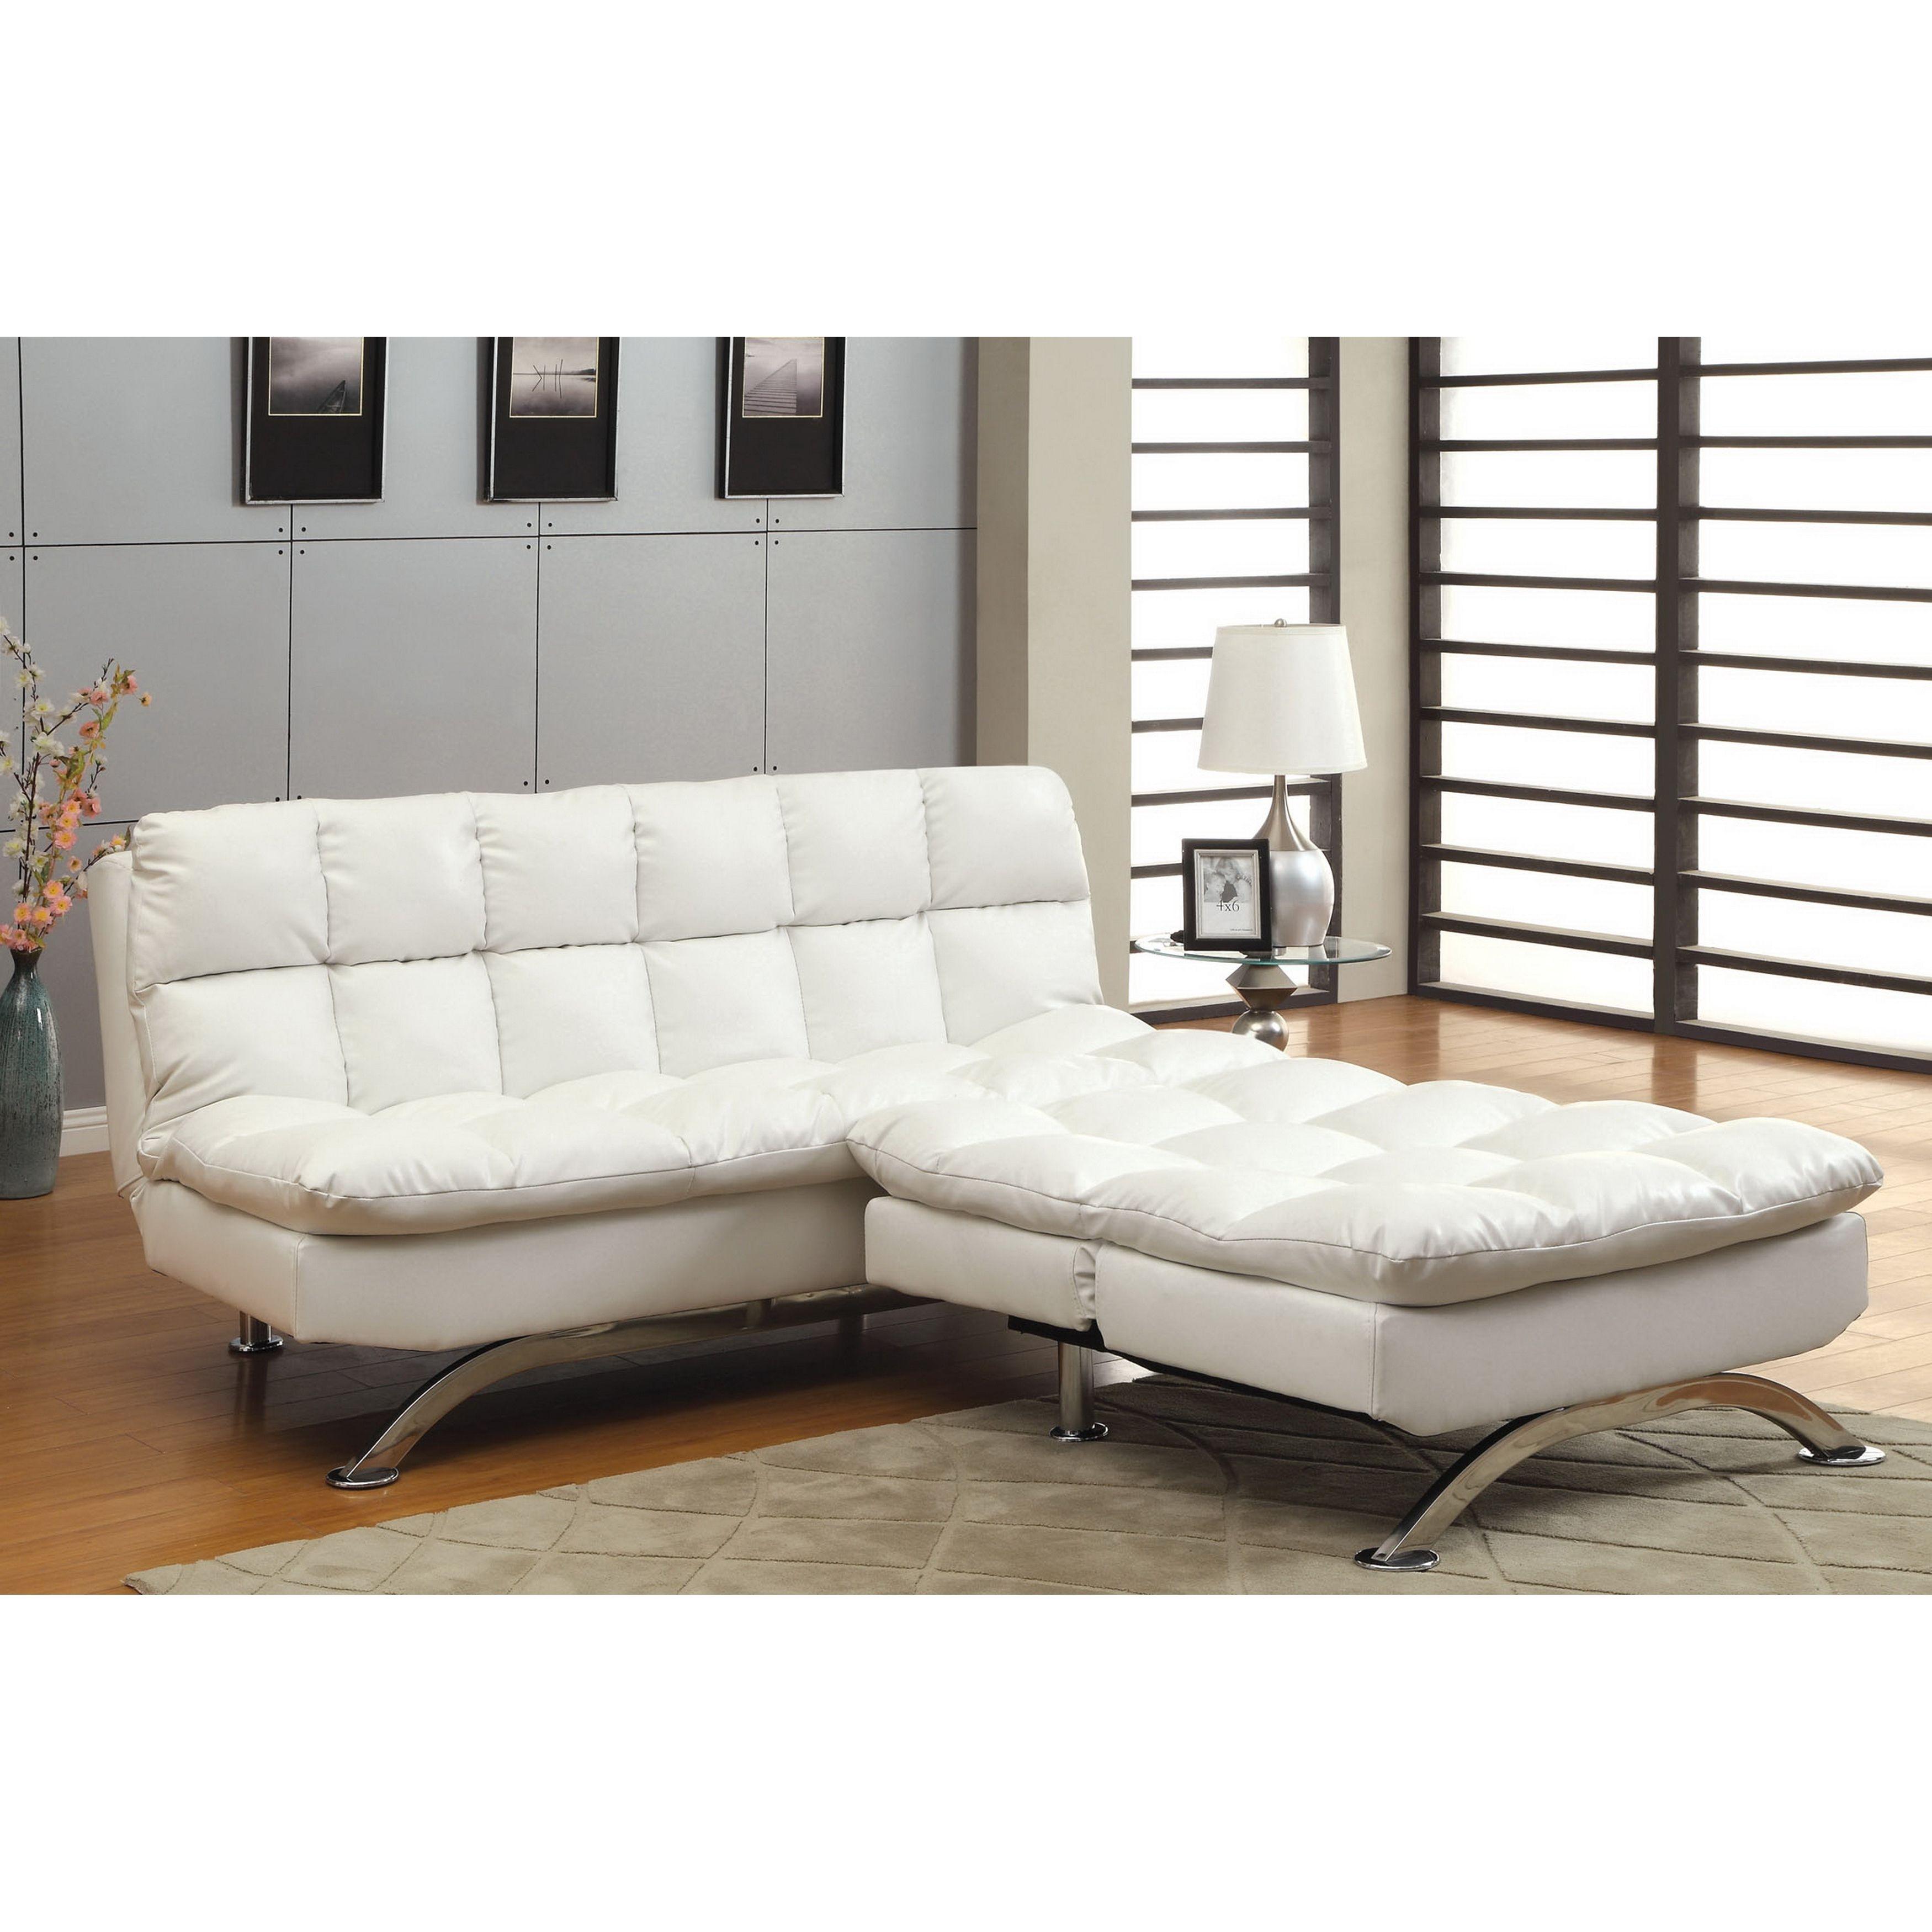 Futon Sofa Home Decor Furniture Modern Tufted Jamaica Convertible Regarding Jamaica Sectional Sofas (Image 3 of 10)